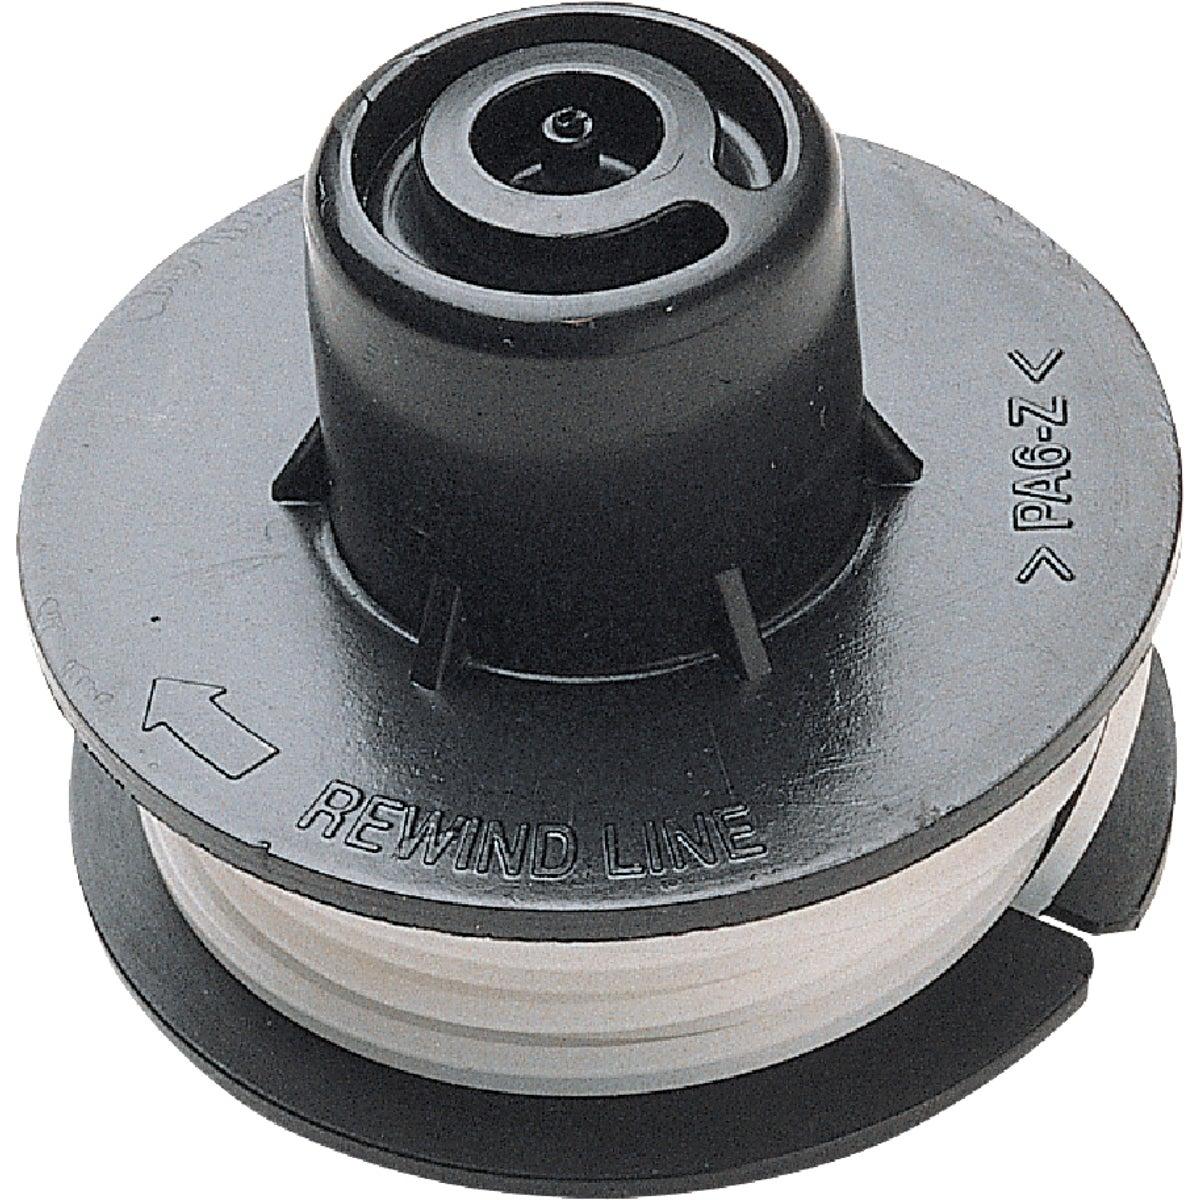 Toro Trimmer Line Spool, 88175